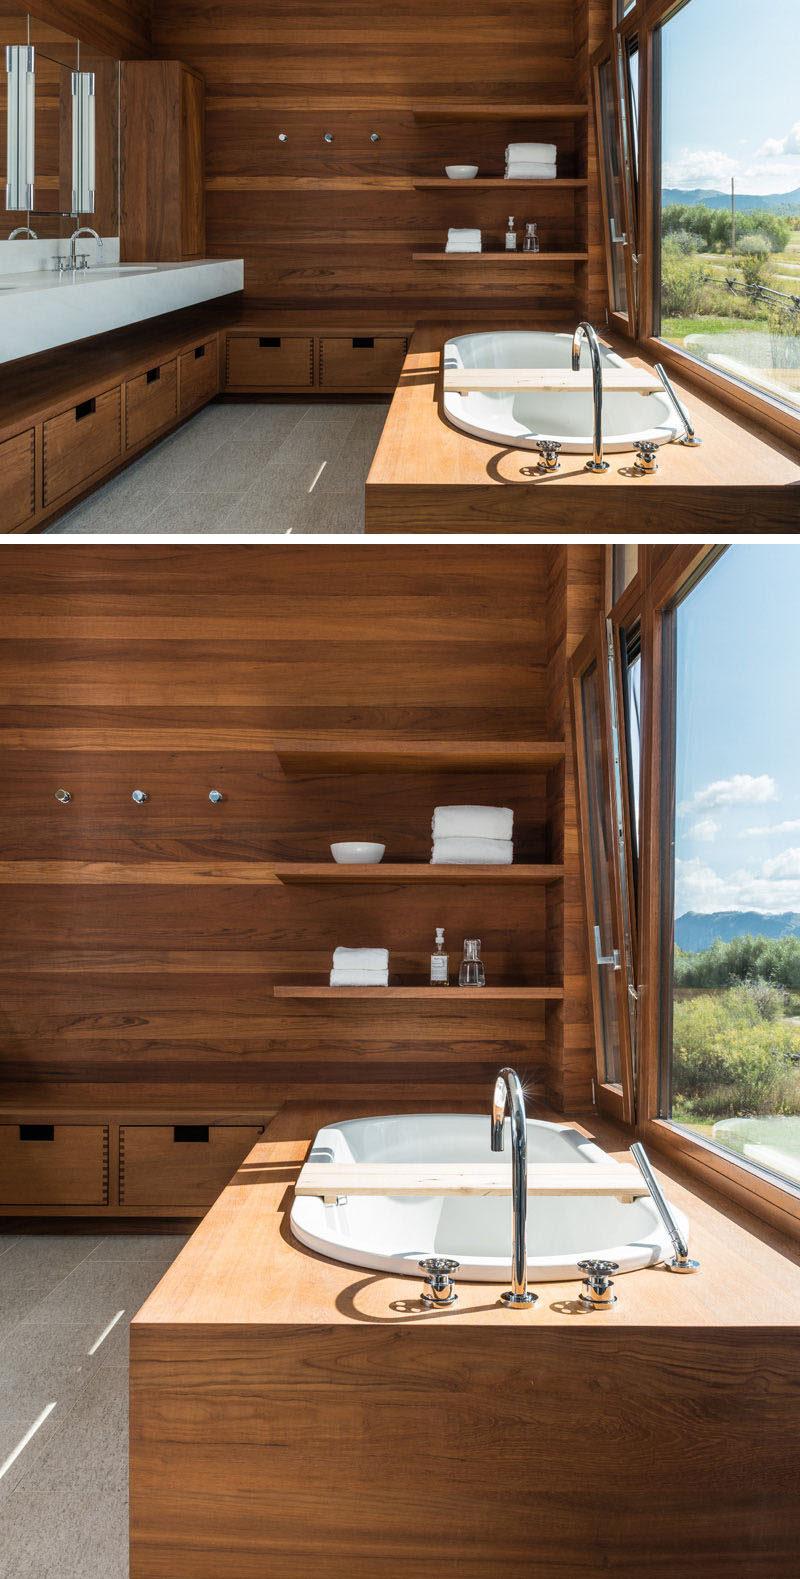 Bathroom Design Idea - Create a Spa-Like Bathroom At Home // Include luxurious wood details.